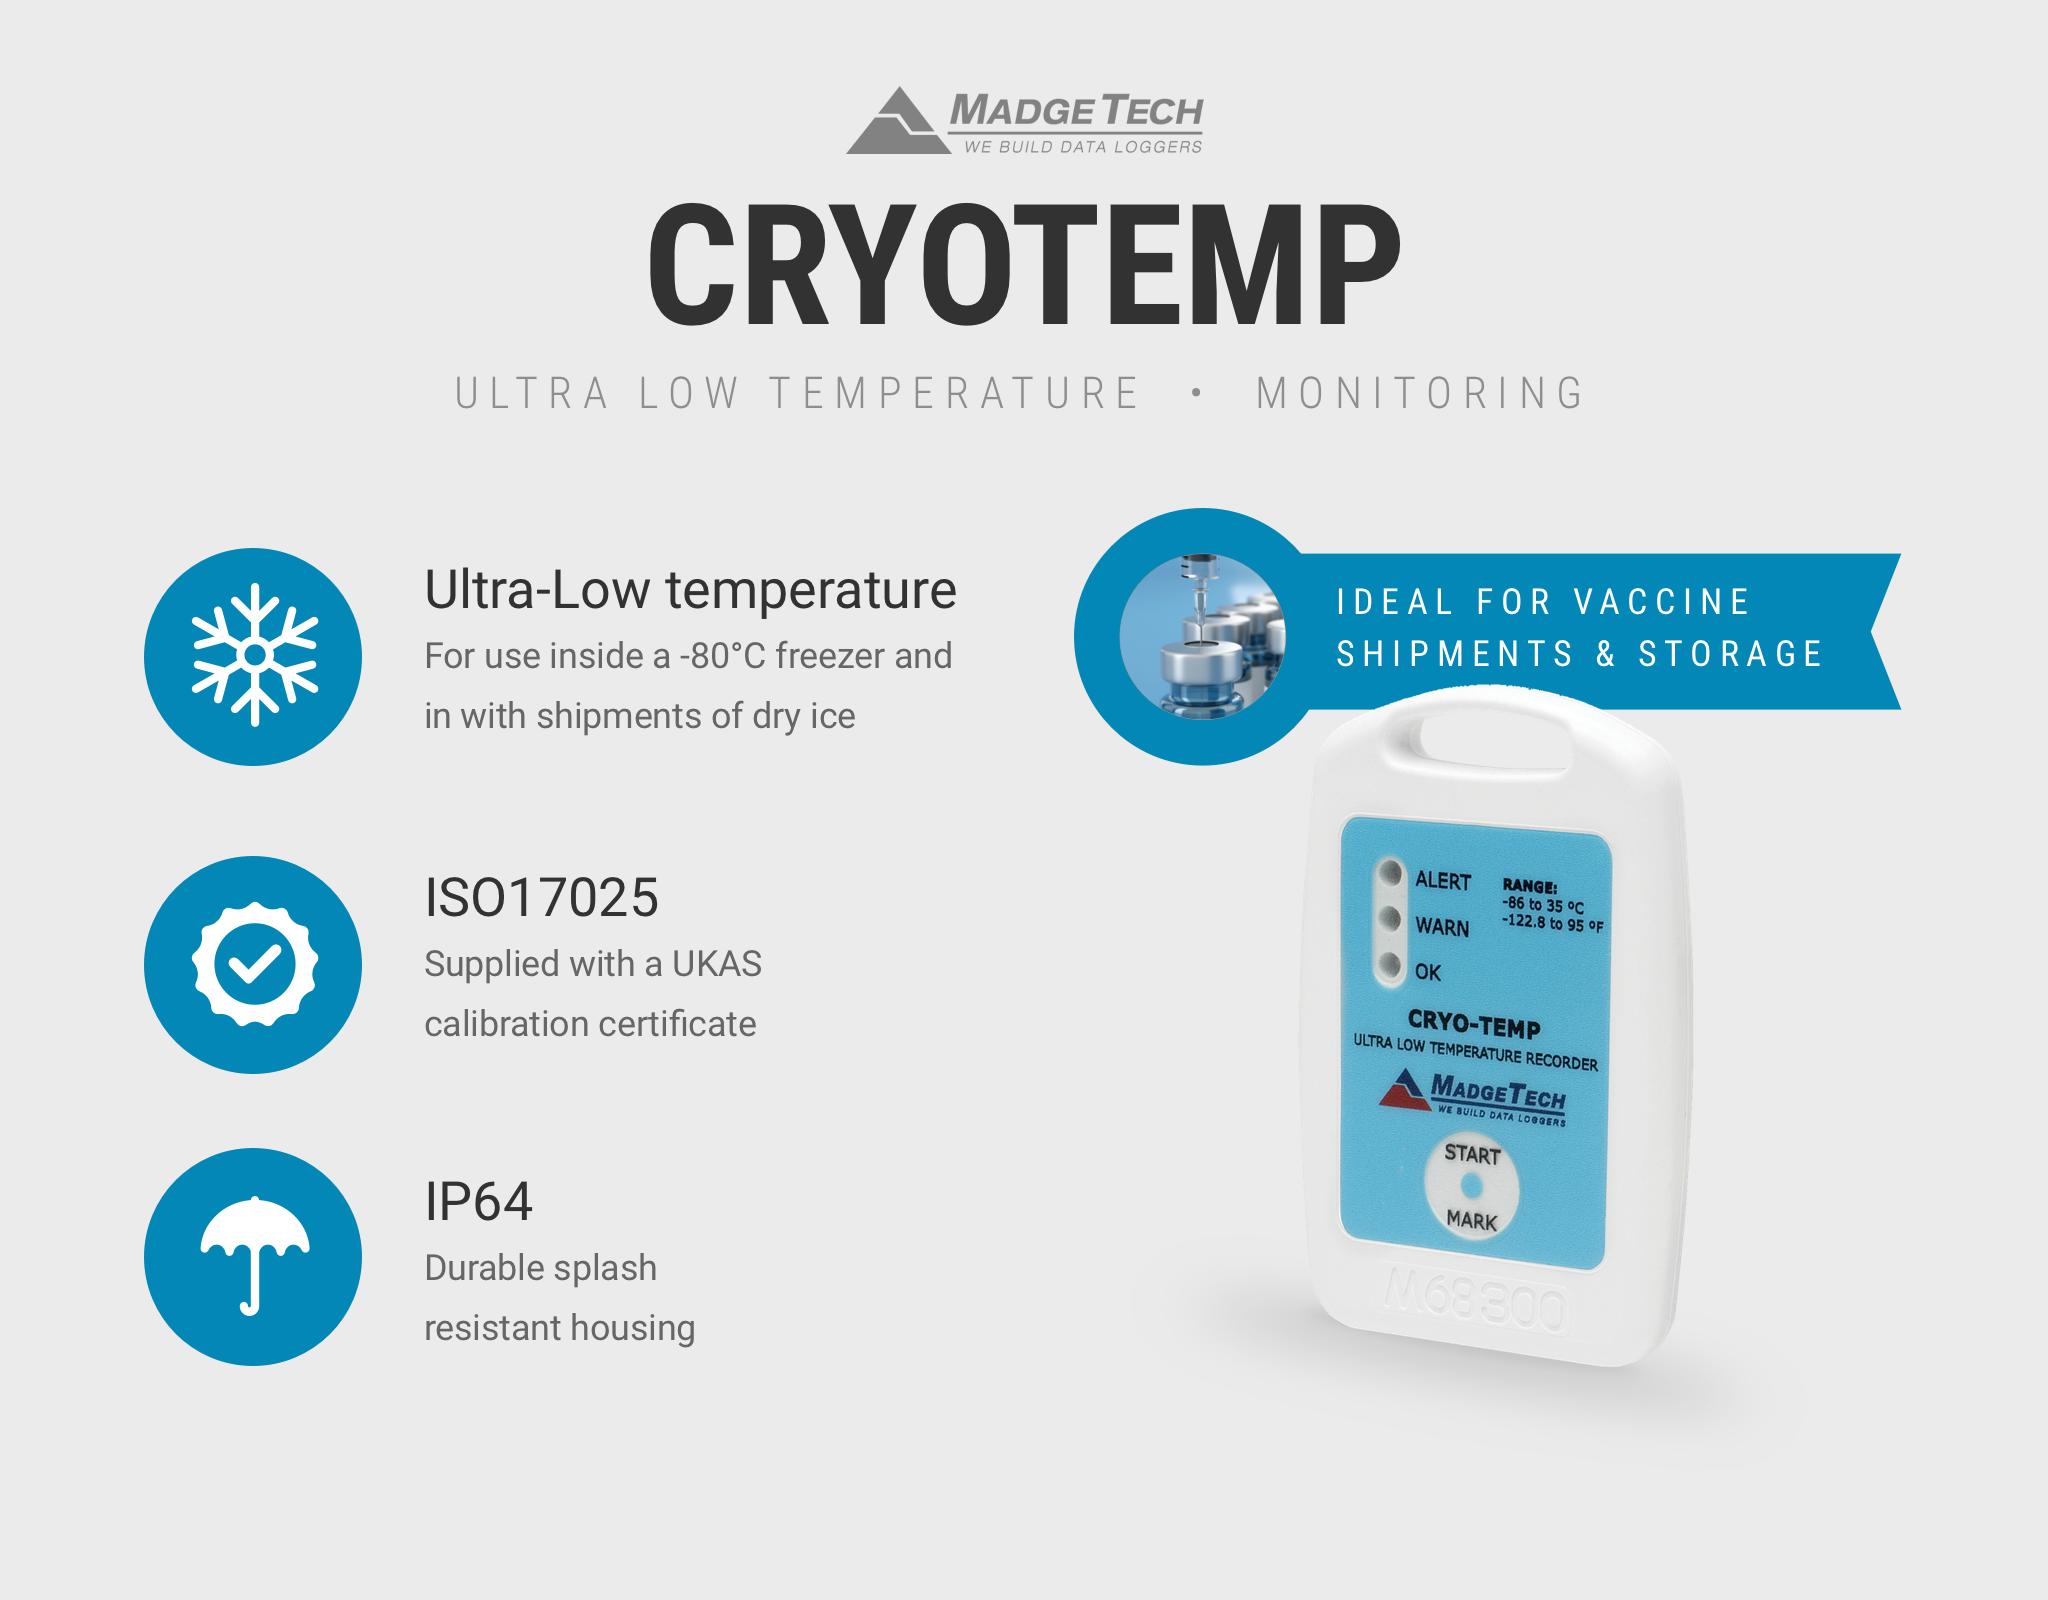 madgetech-cryotemp-vaccine-storage-low-temperature-data-logger